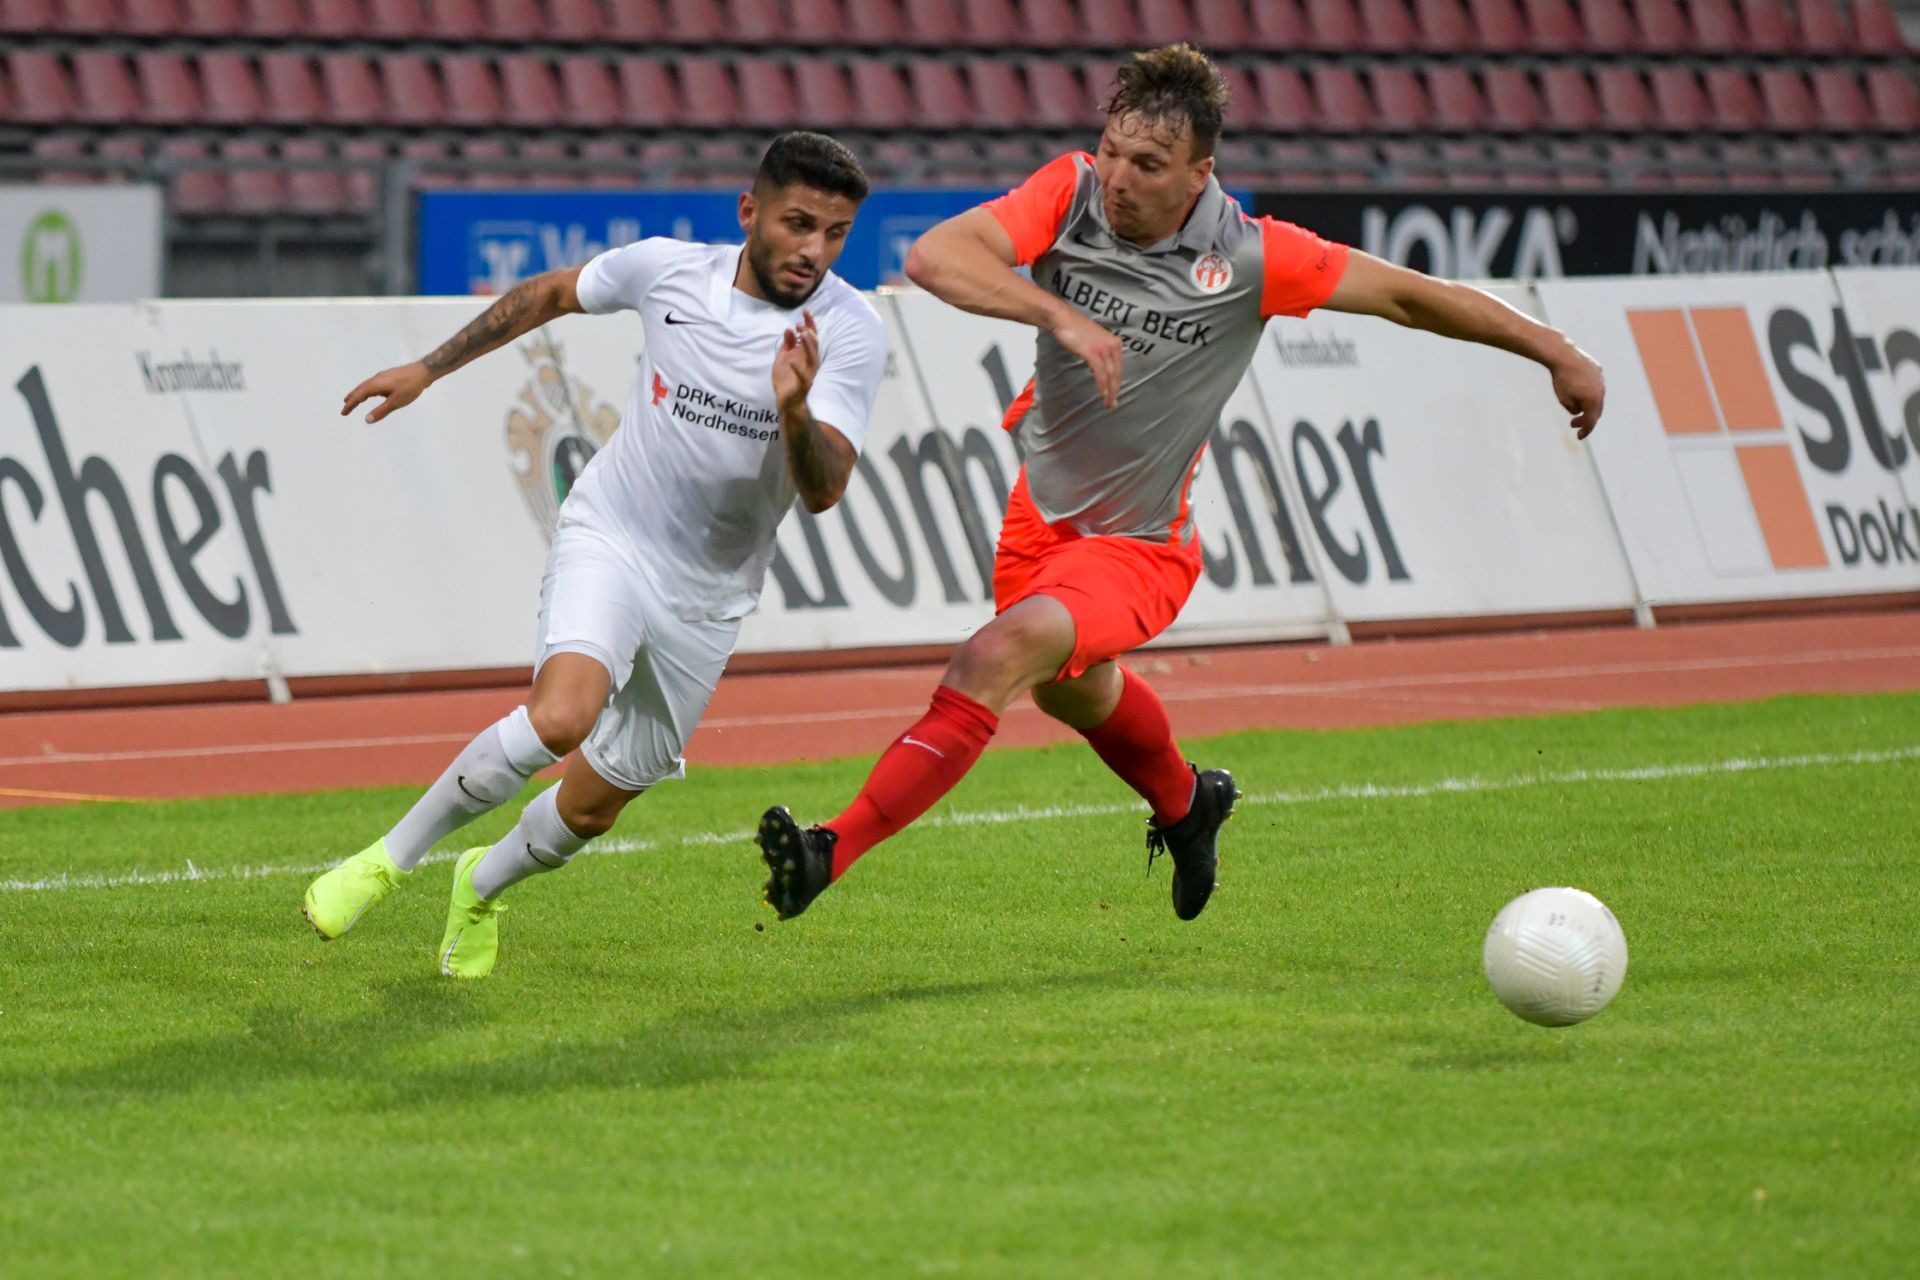 Kreispokal-Halbfinale, CSC 03 Kassel, KSV Hessen Kassel, Endstand 1:5